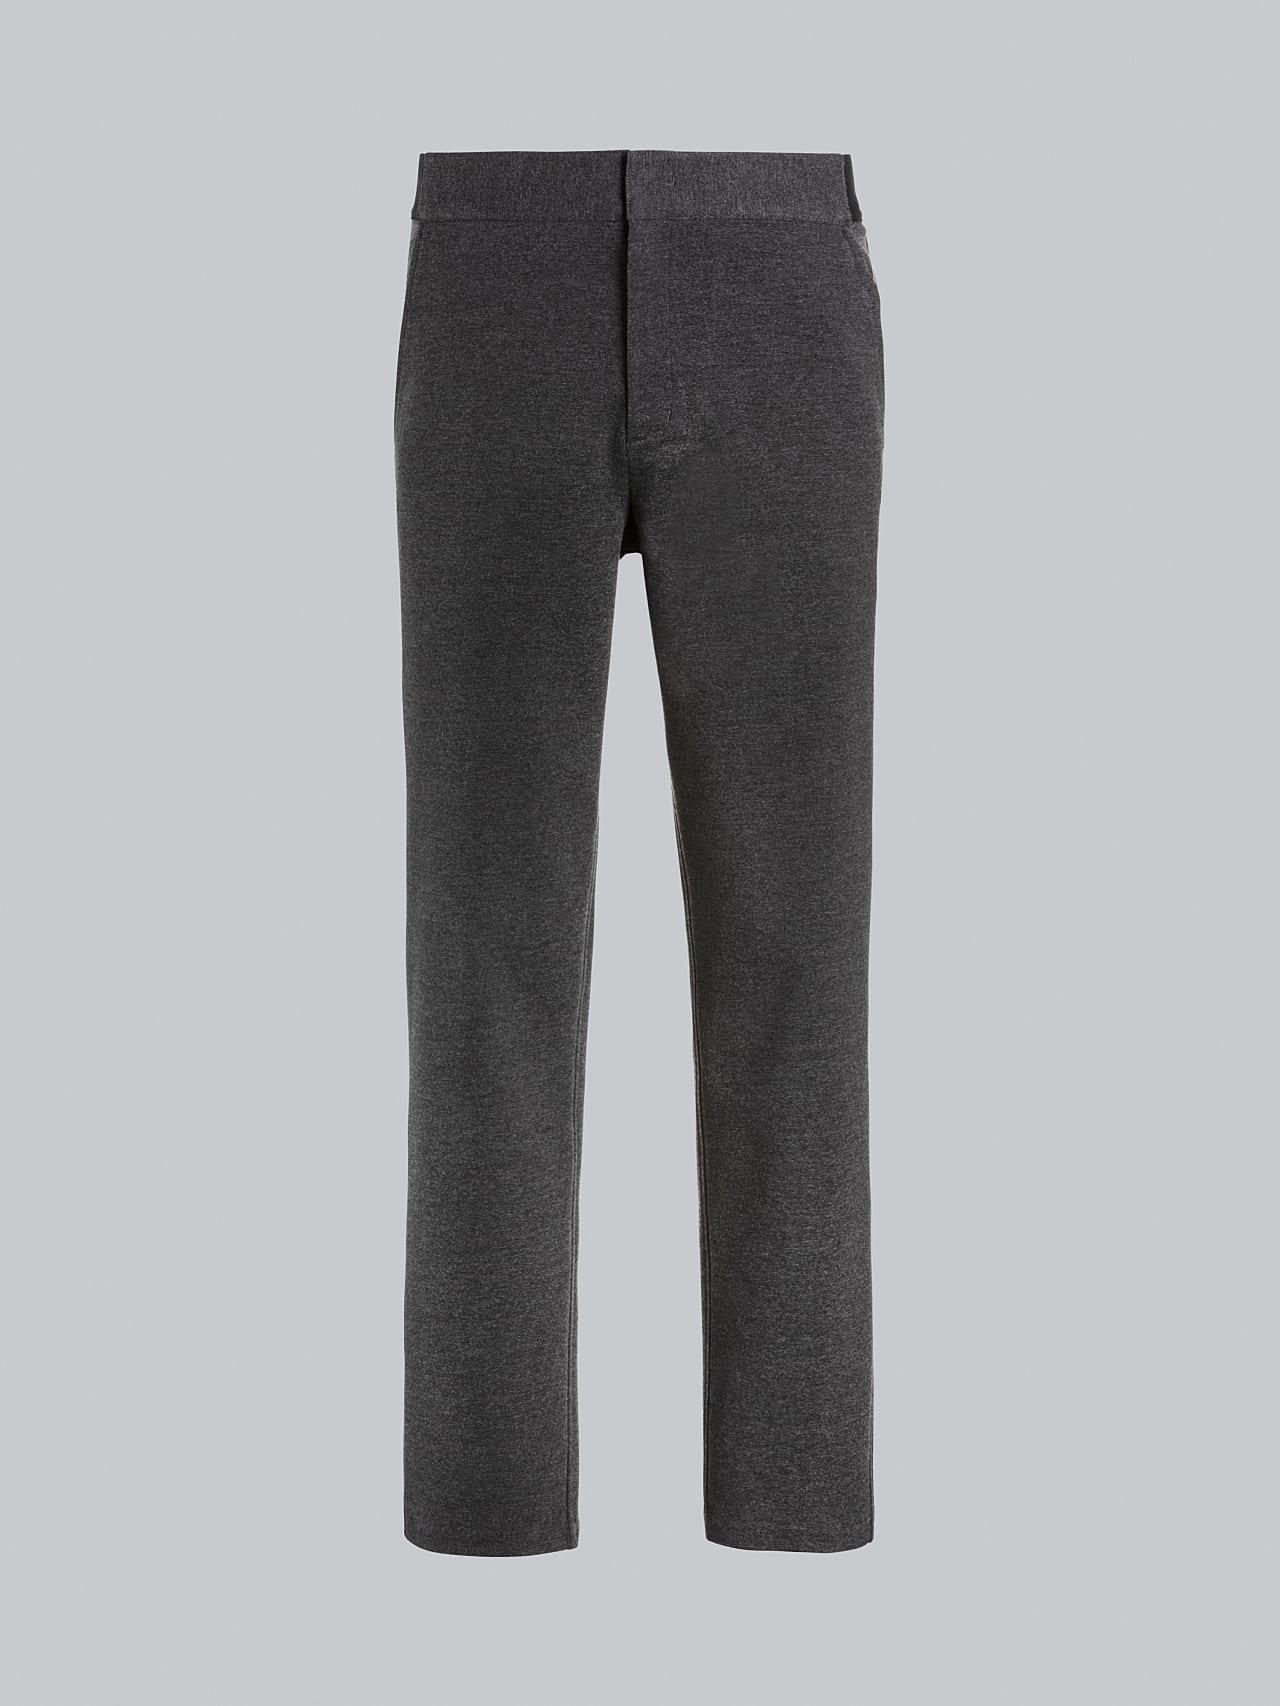 PRINO V2.Y5.02 Cropped Waterproof Sweat Pants dark grey / anthracite Back Alpha Tauri